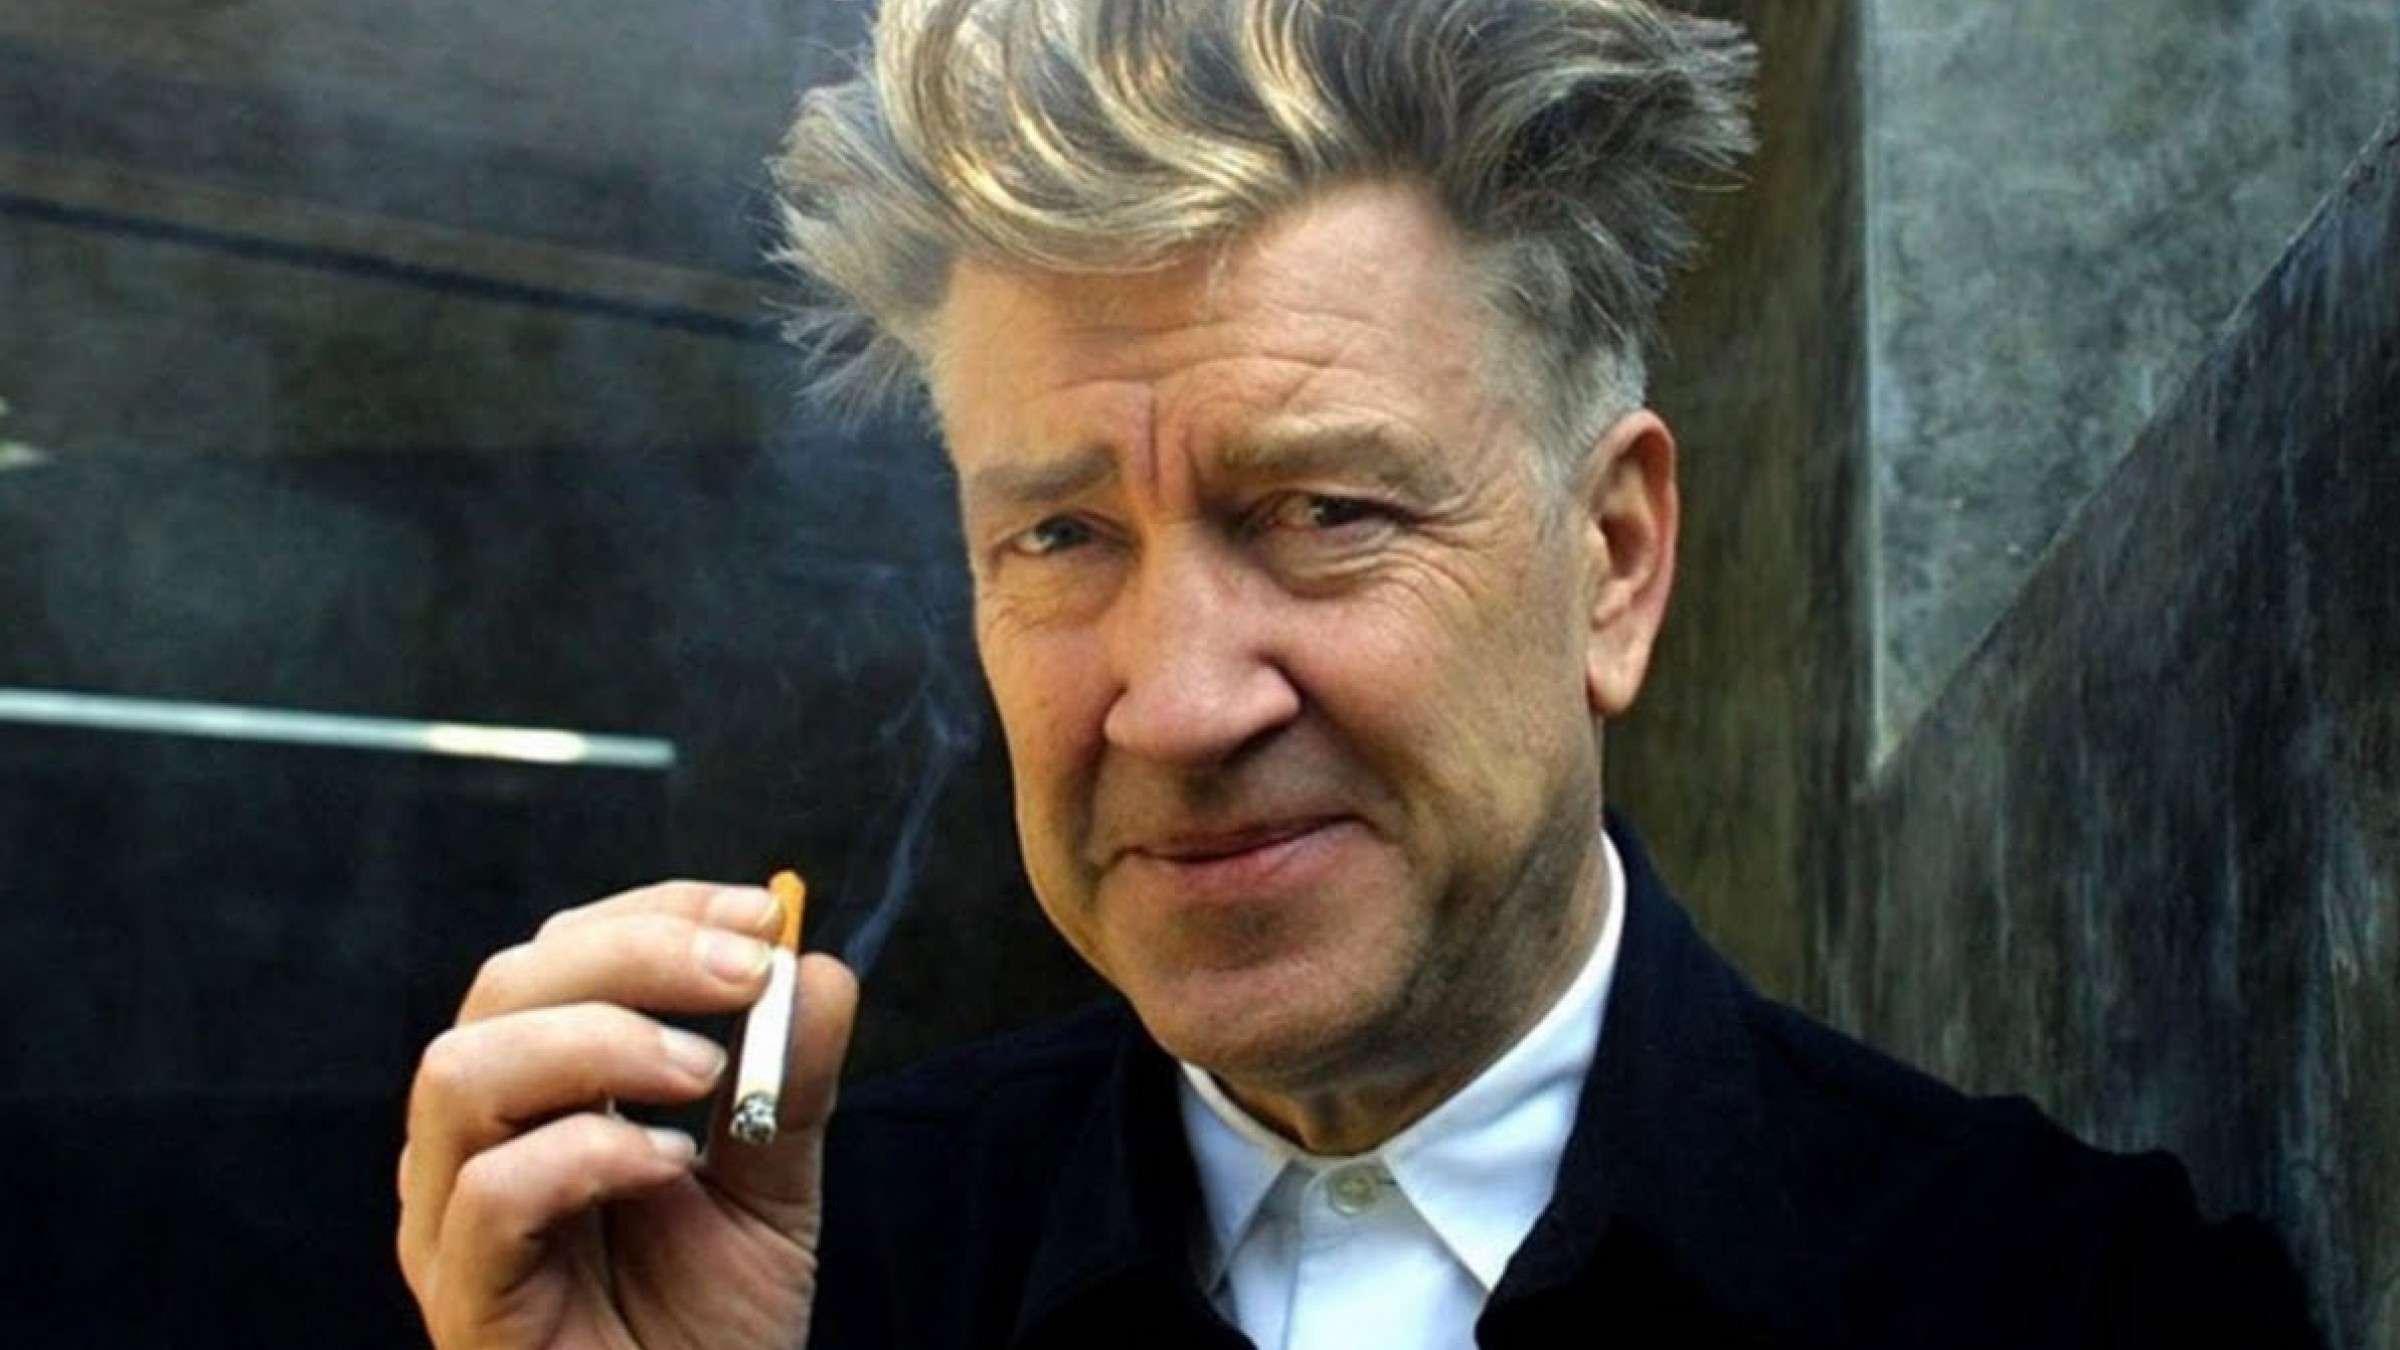 David Lynch interviewed in David Lynch: The Art Life (2017)